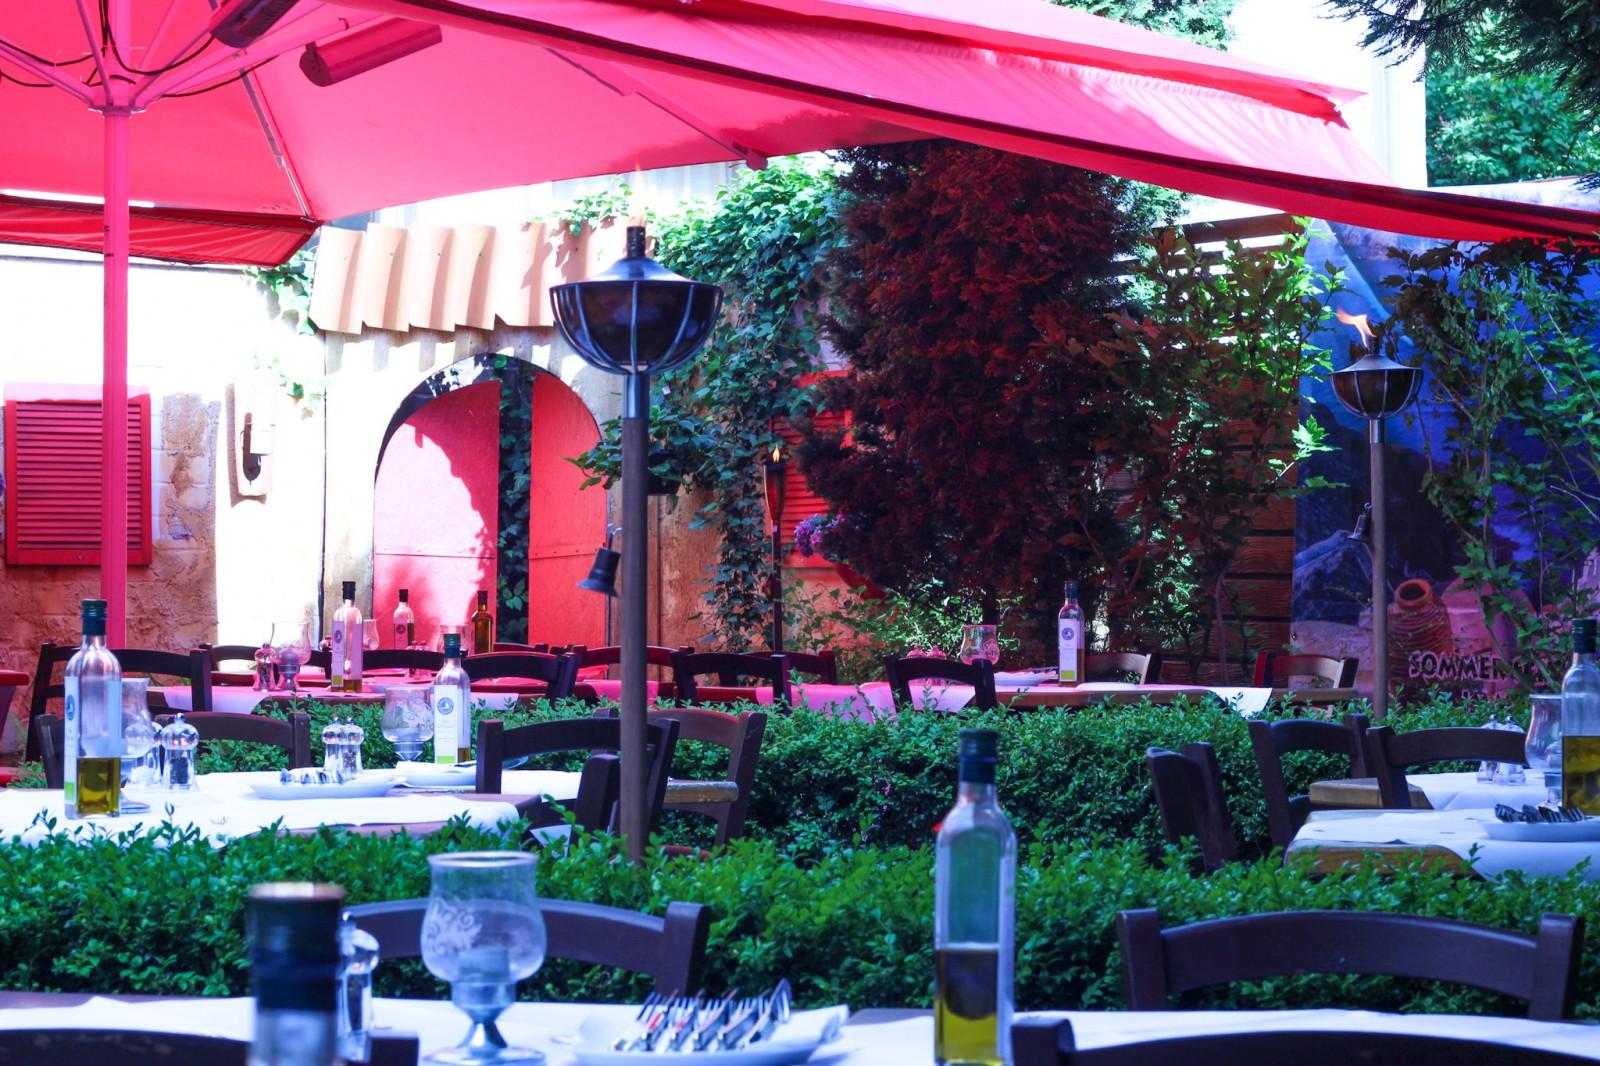 Restaurant Palladion in Hannover